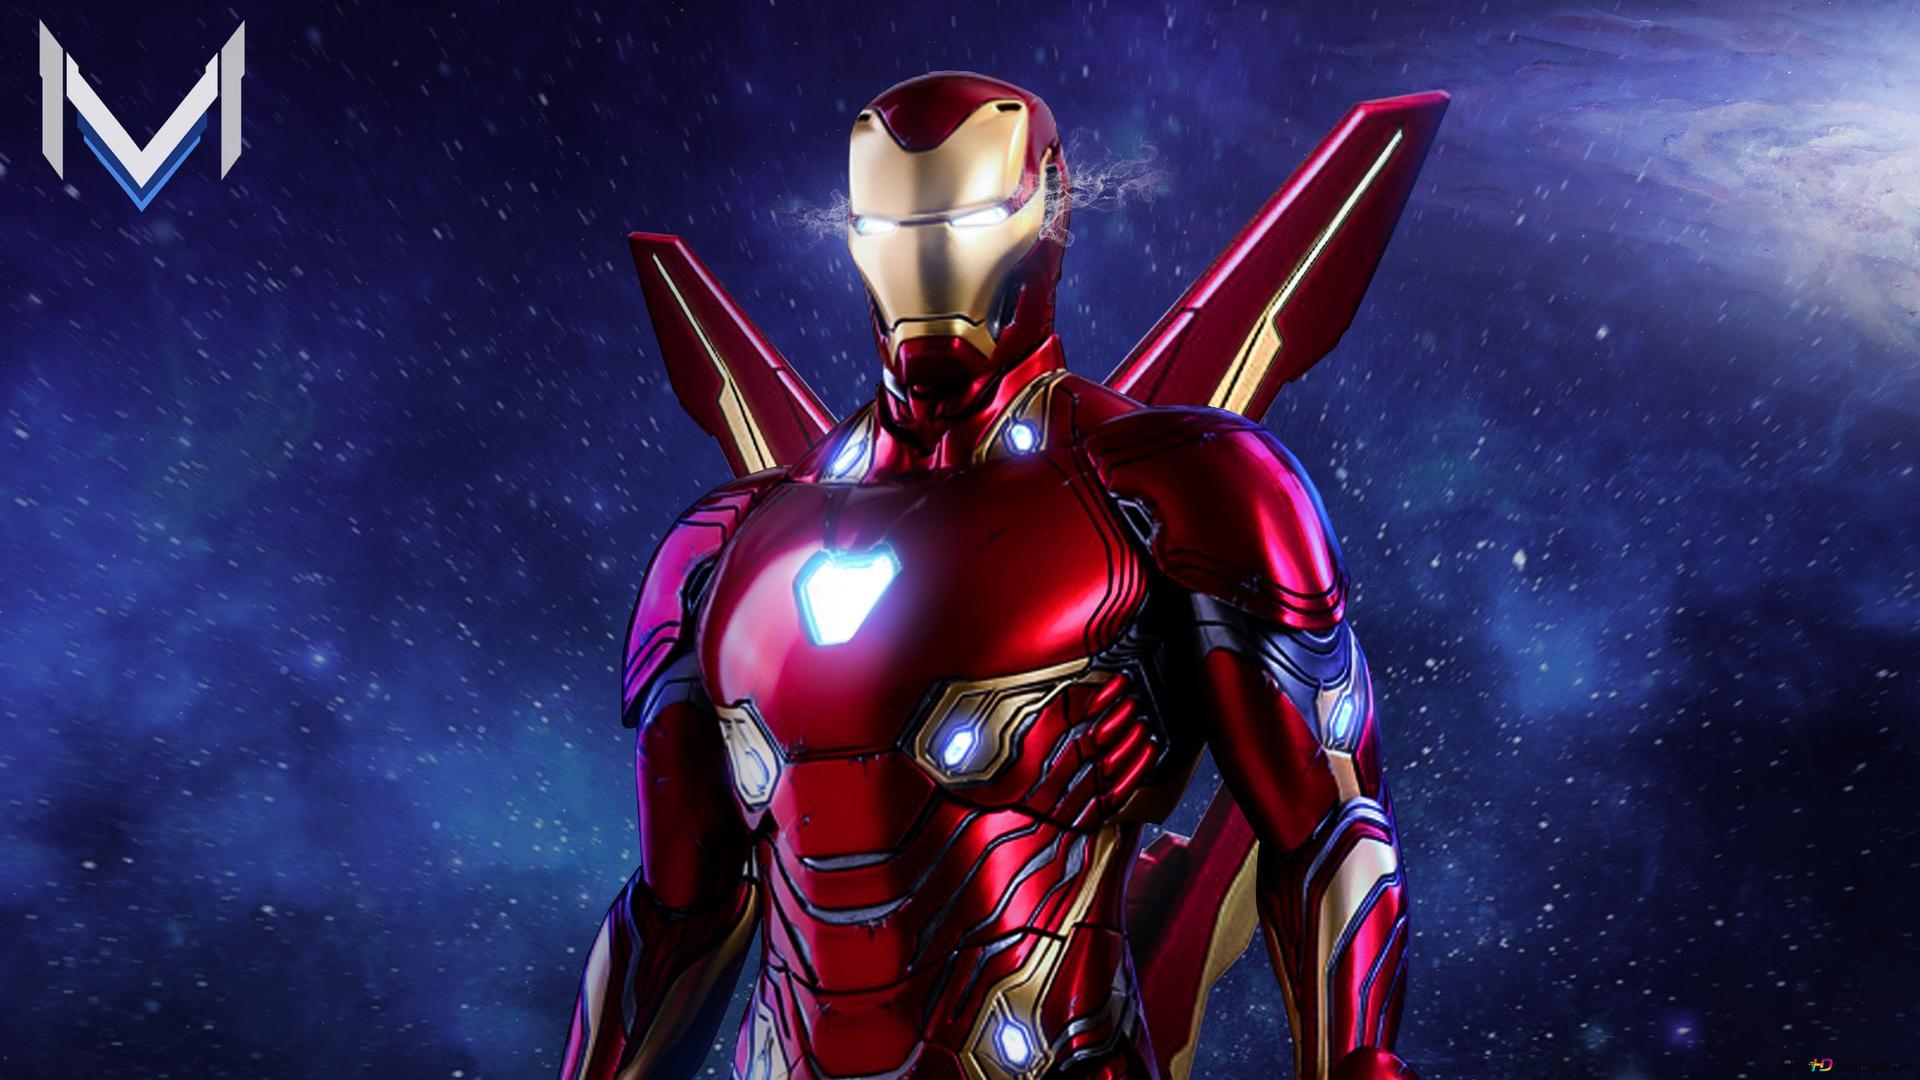 Avengers Endgame Ironman Superheld Hd Hintergrundbilder